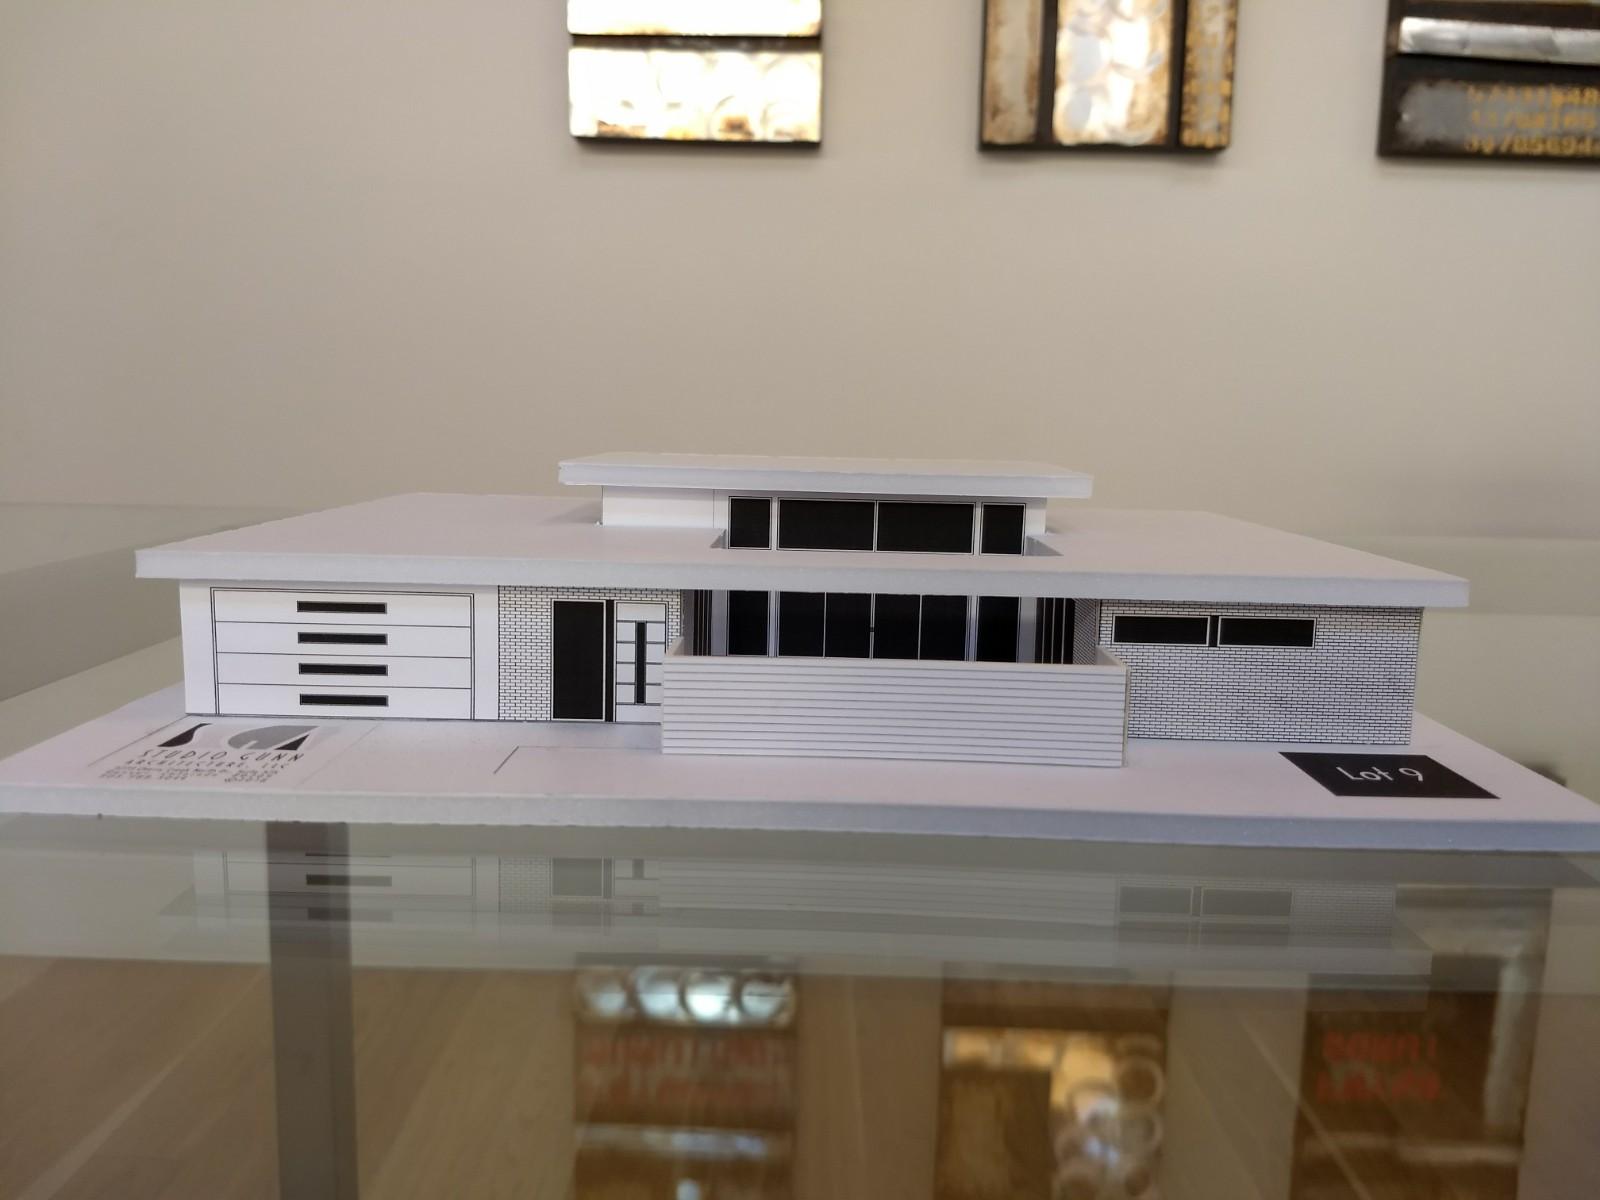 9 WL model 1